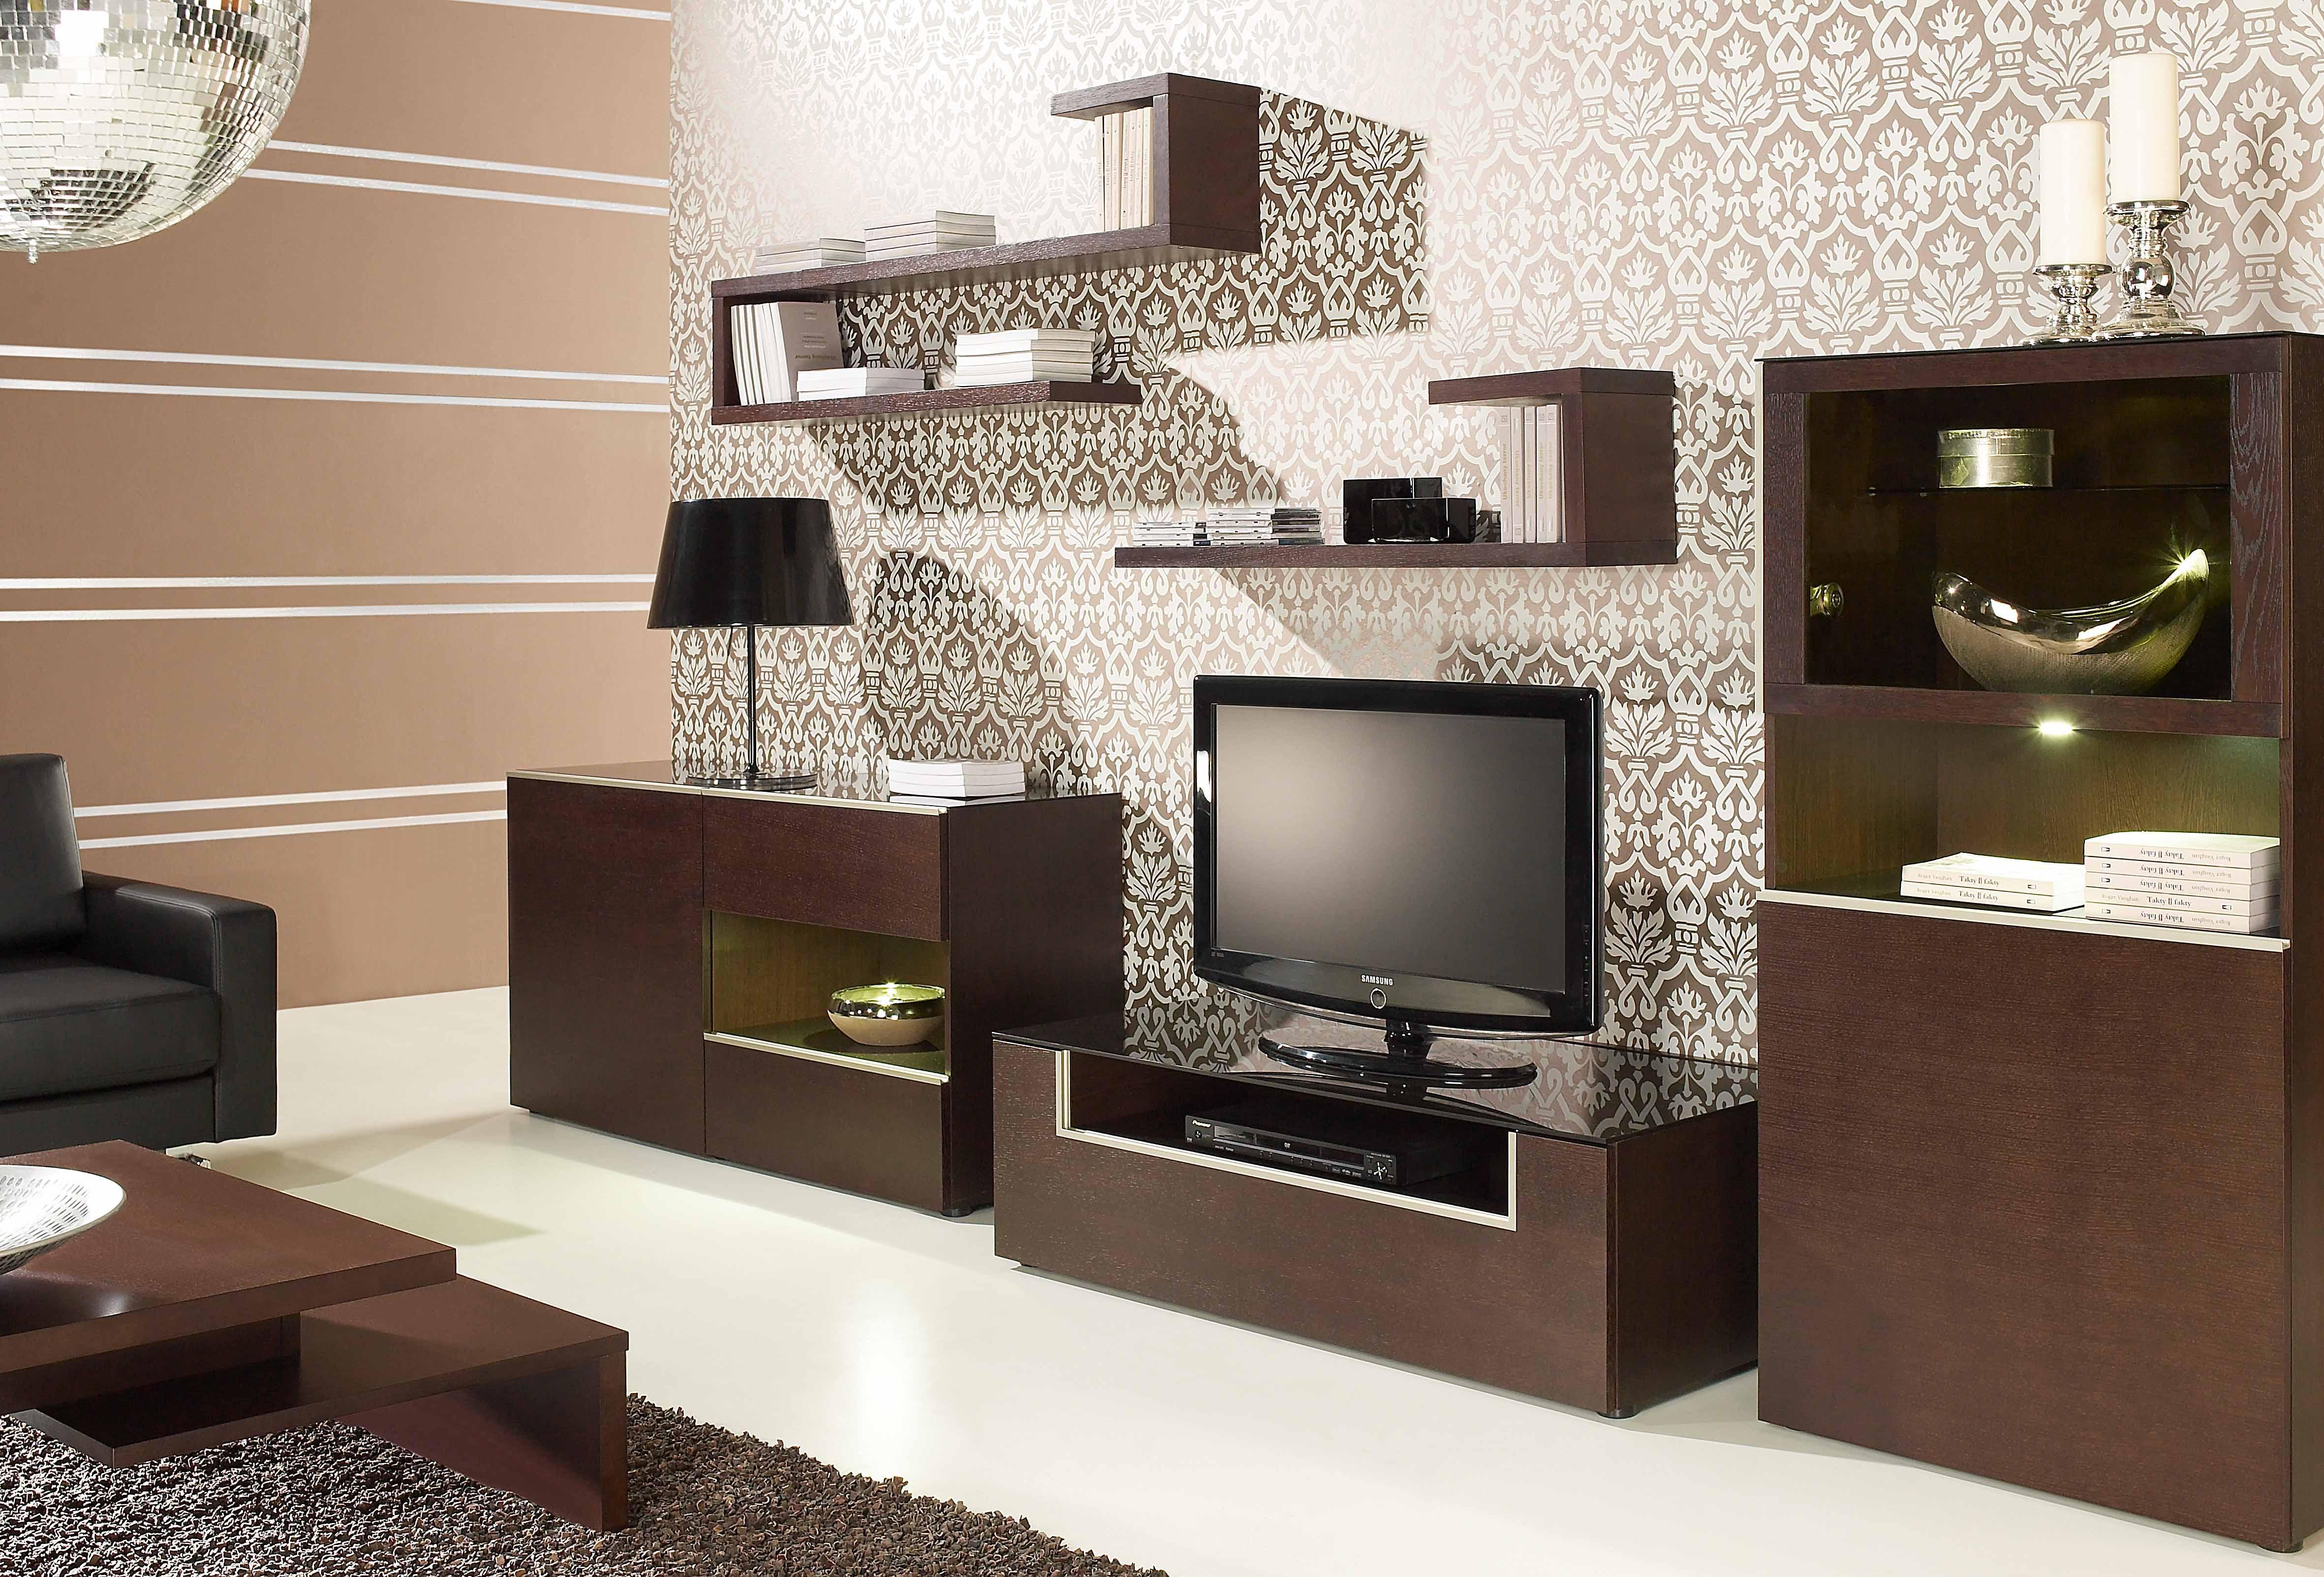 D mobilier modern next canapele coltare din piele for Meuble de living moderne